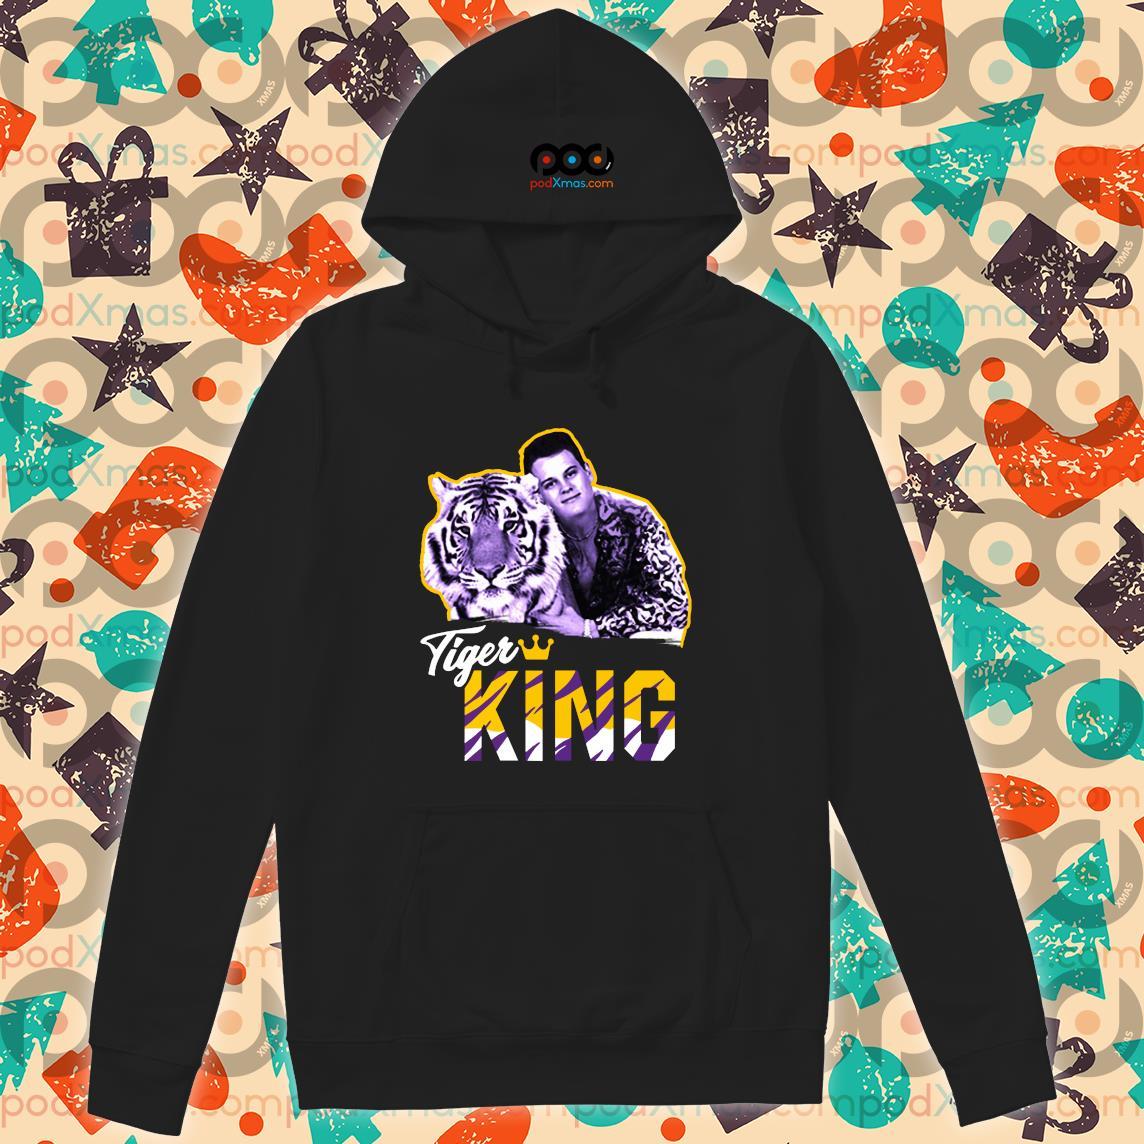 Tiger King T-Shirt Hoodie PODxmas den